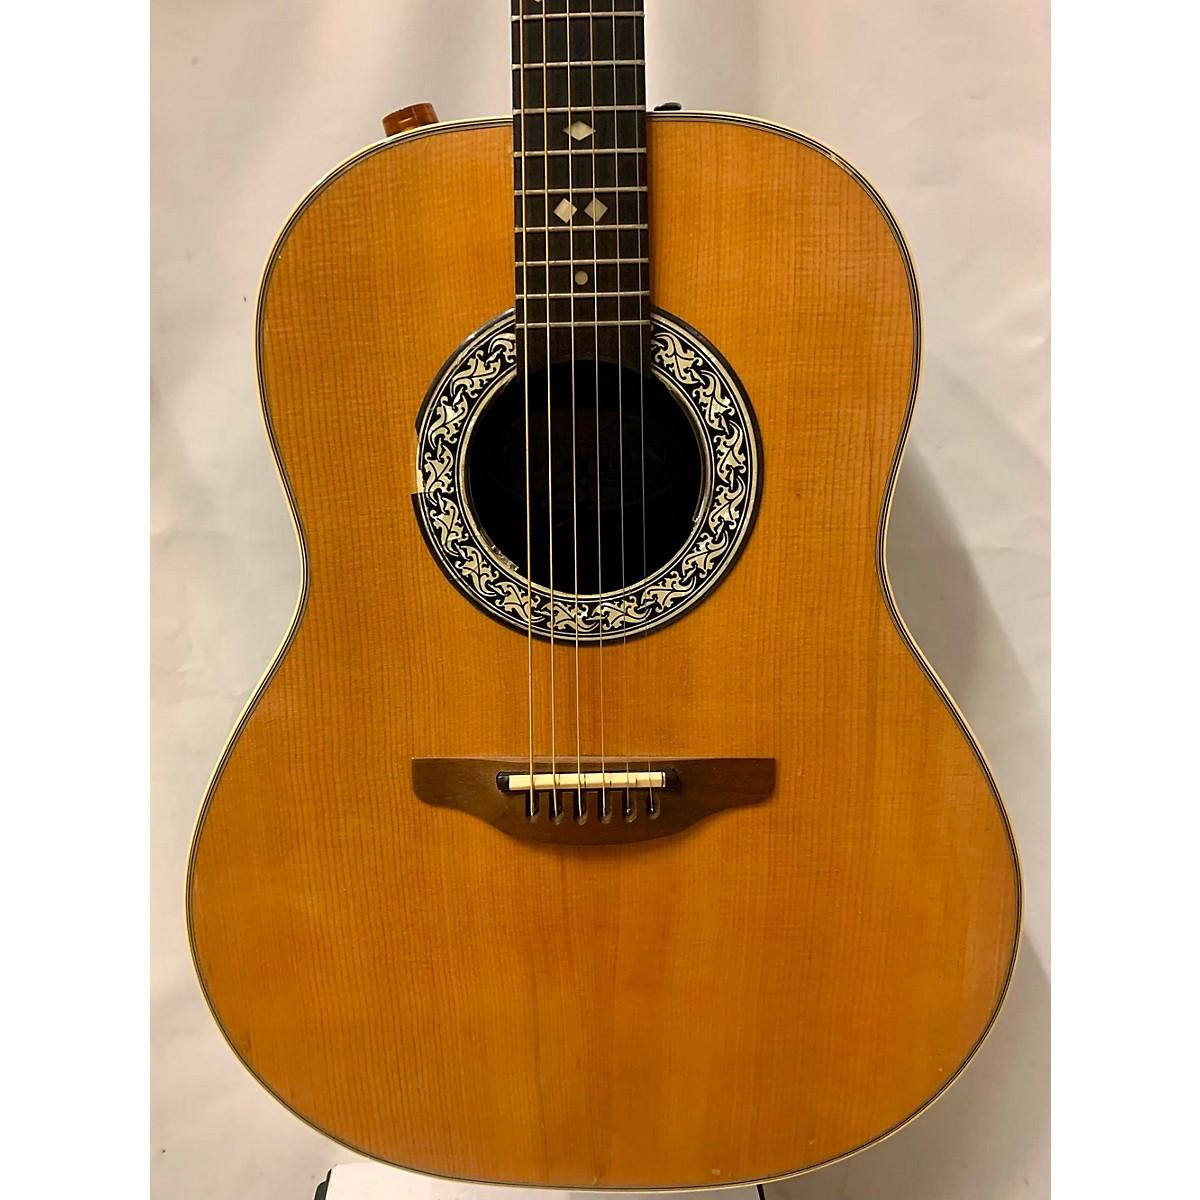 Ovation 1979 1612 Balladeer Acoustic Electric Guitar